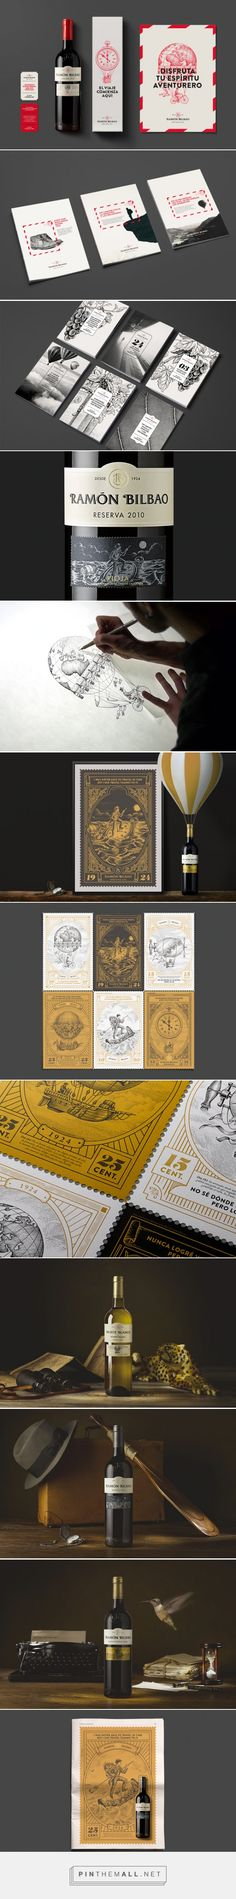 The Taste of Adventure #wine #packaging designed by Interbrand - http://www.packagingoftheworld.com/2015/05/the-taste-of-adventure.html